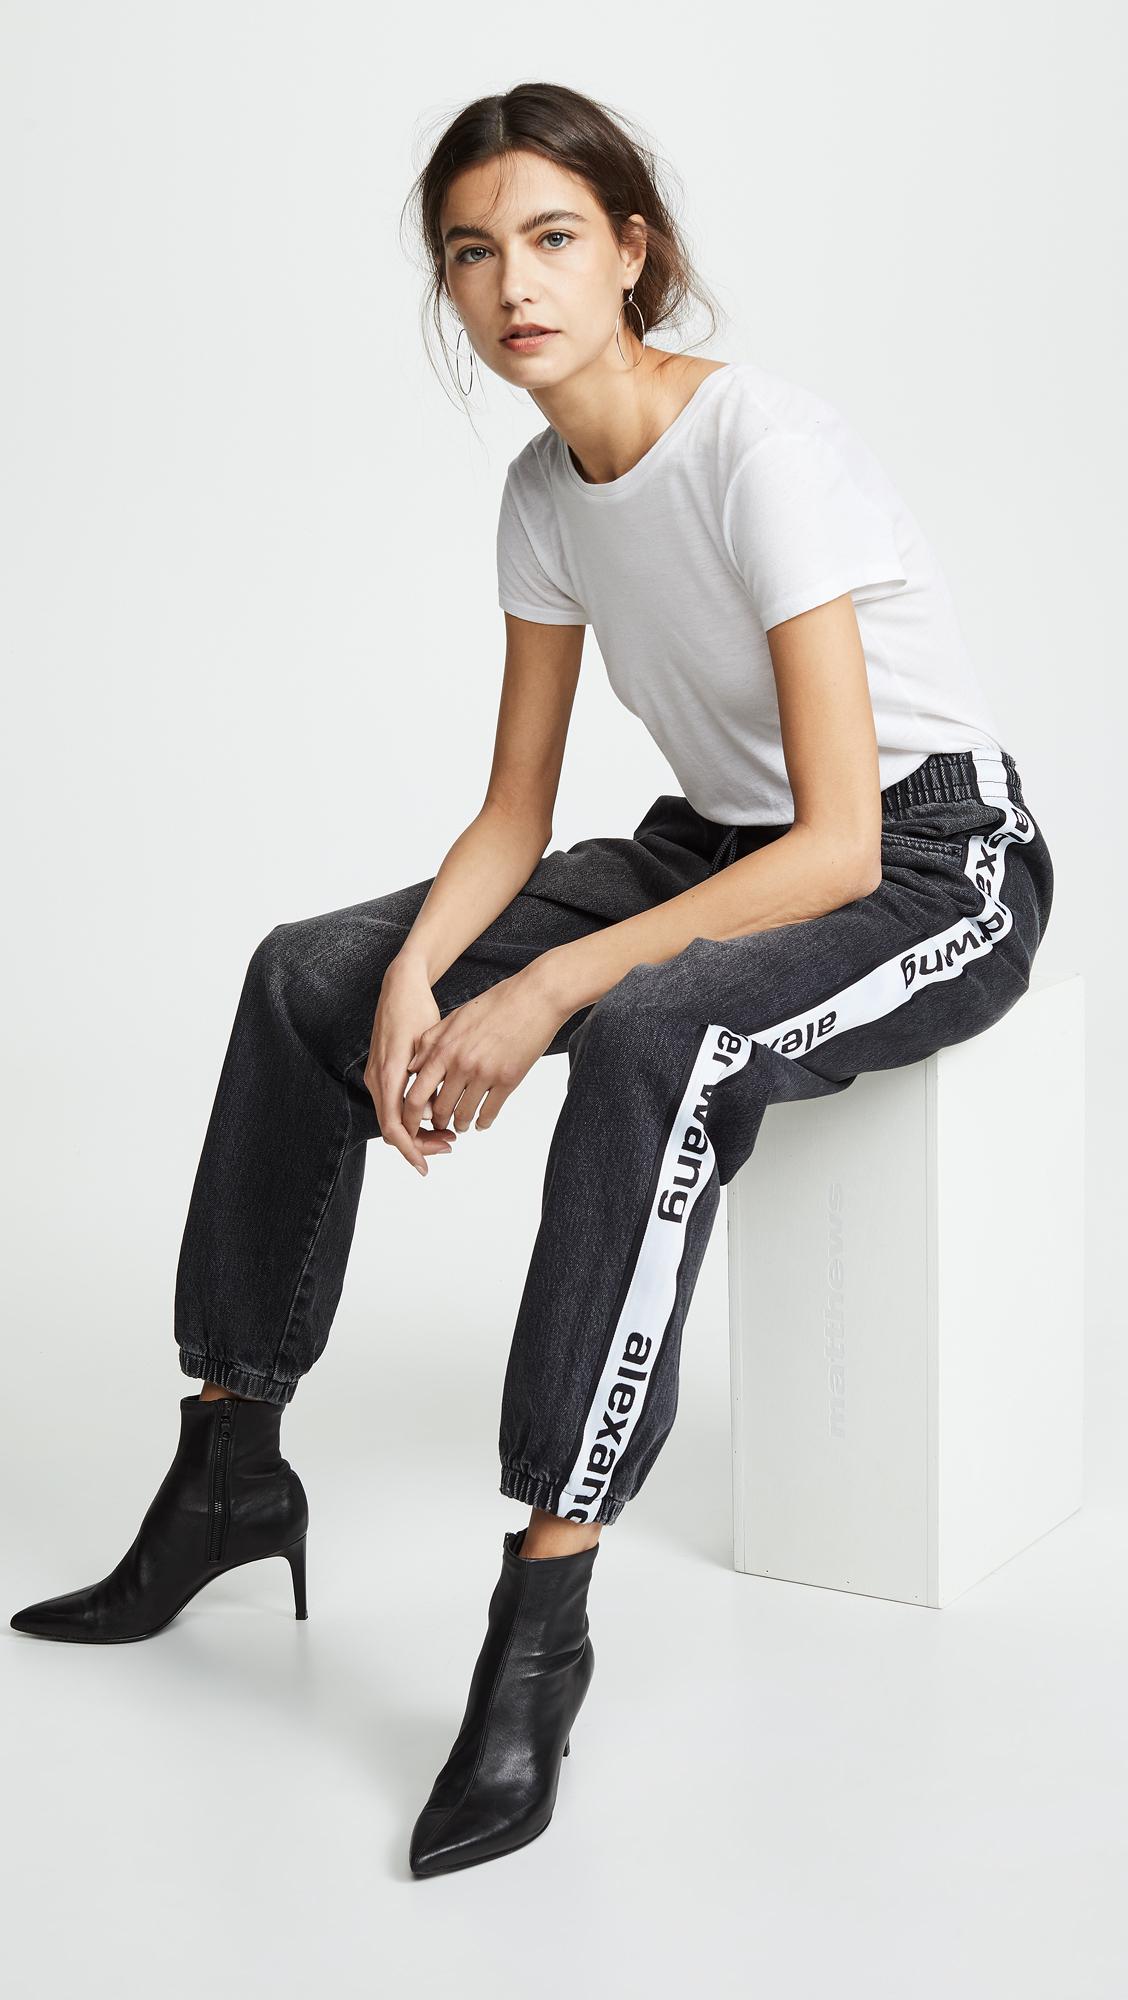 Jeans of the Week: Denim x Alexander Wang Track Pants